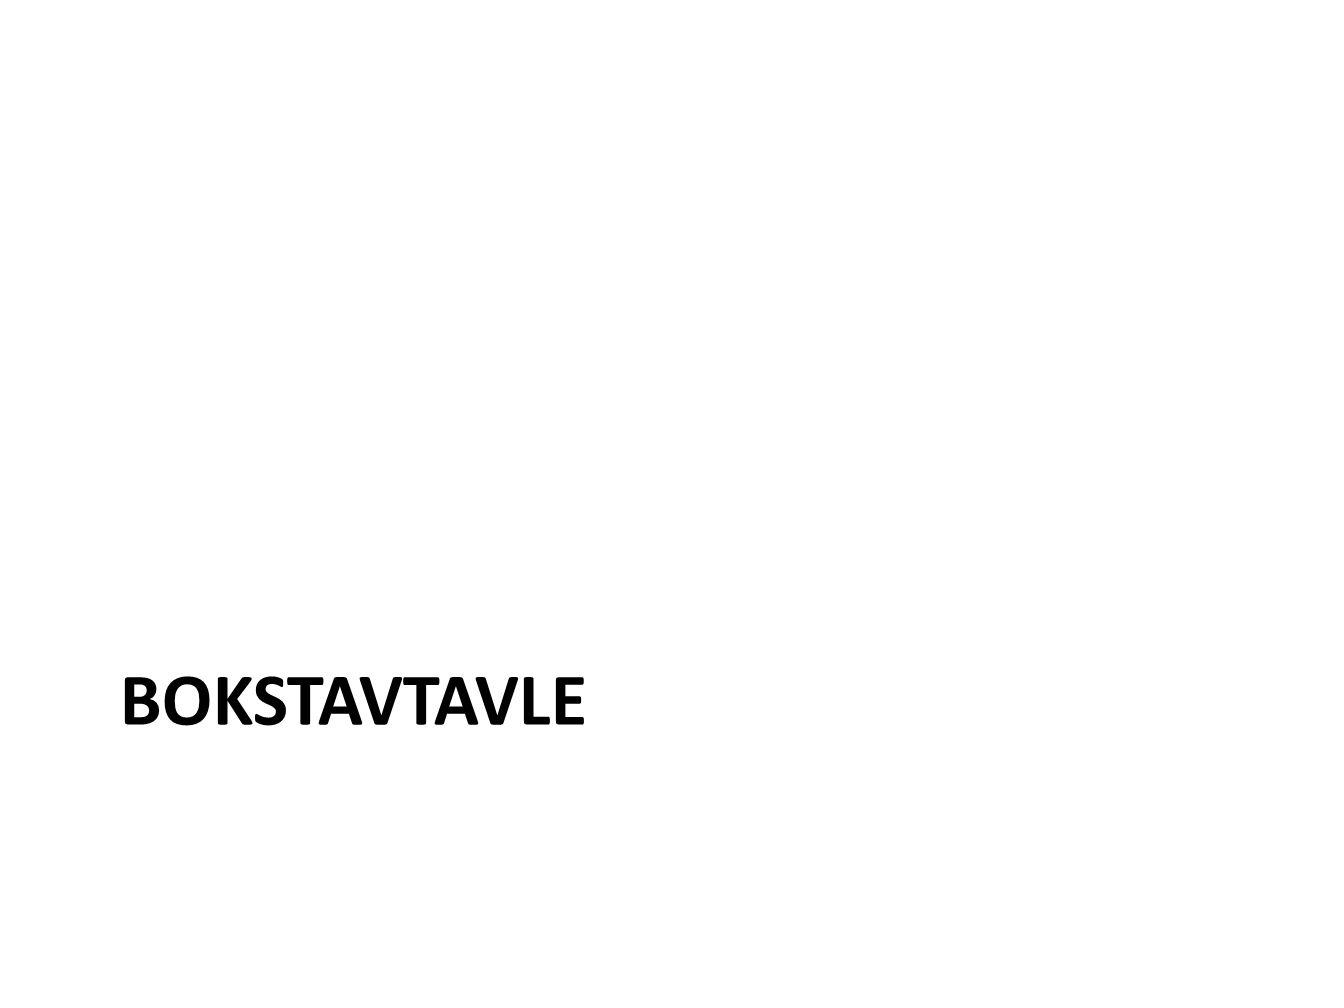 BOKSTAVTAVLE